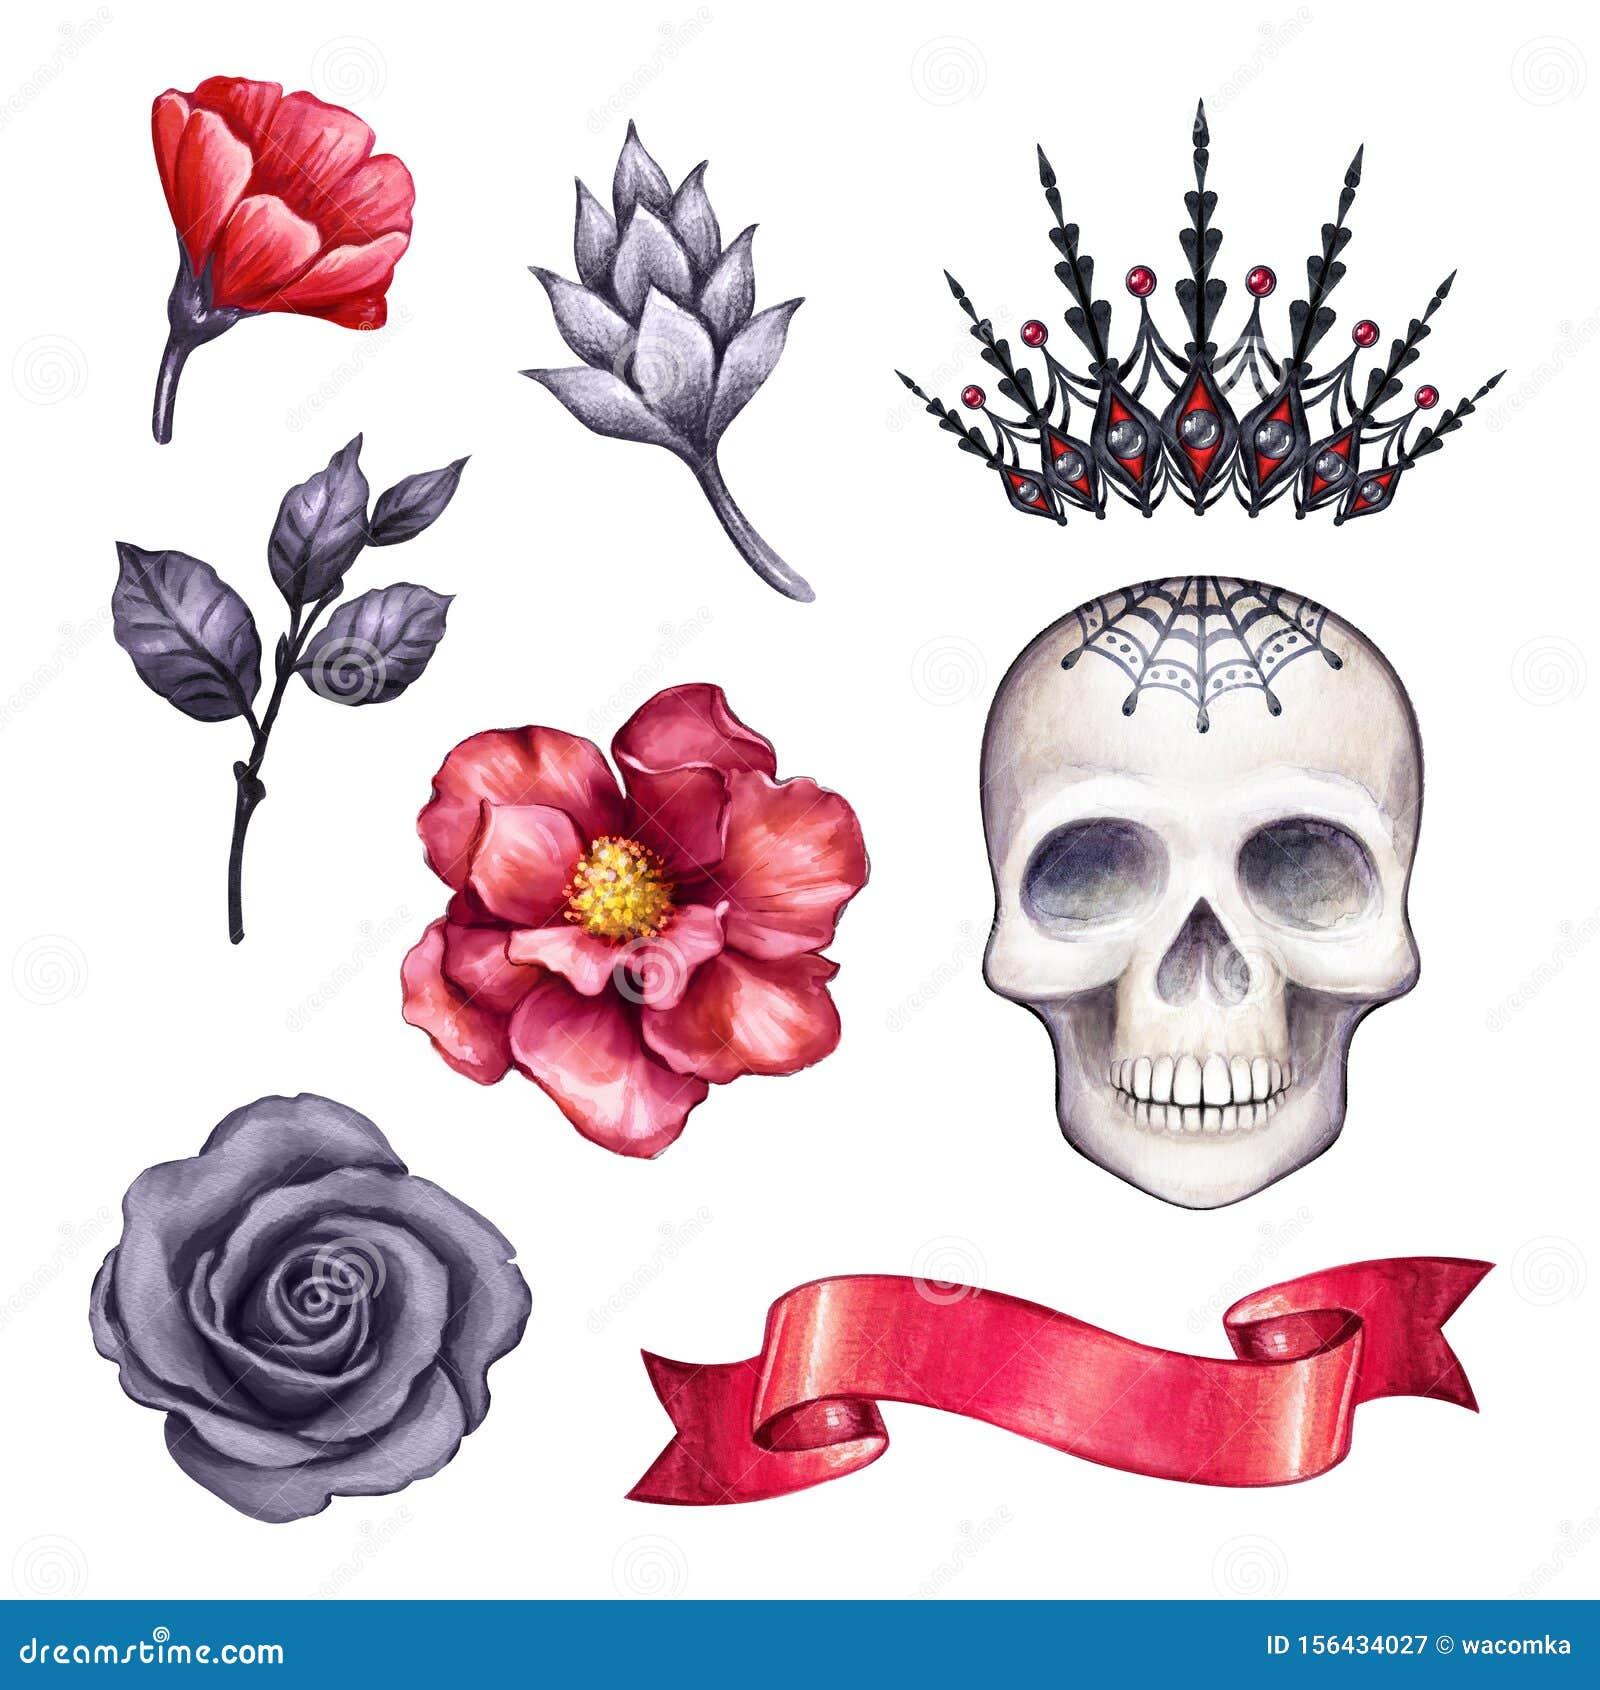 Watercolor Illustration, Halloween Clip Art, Gothic Design ...